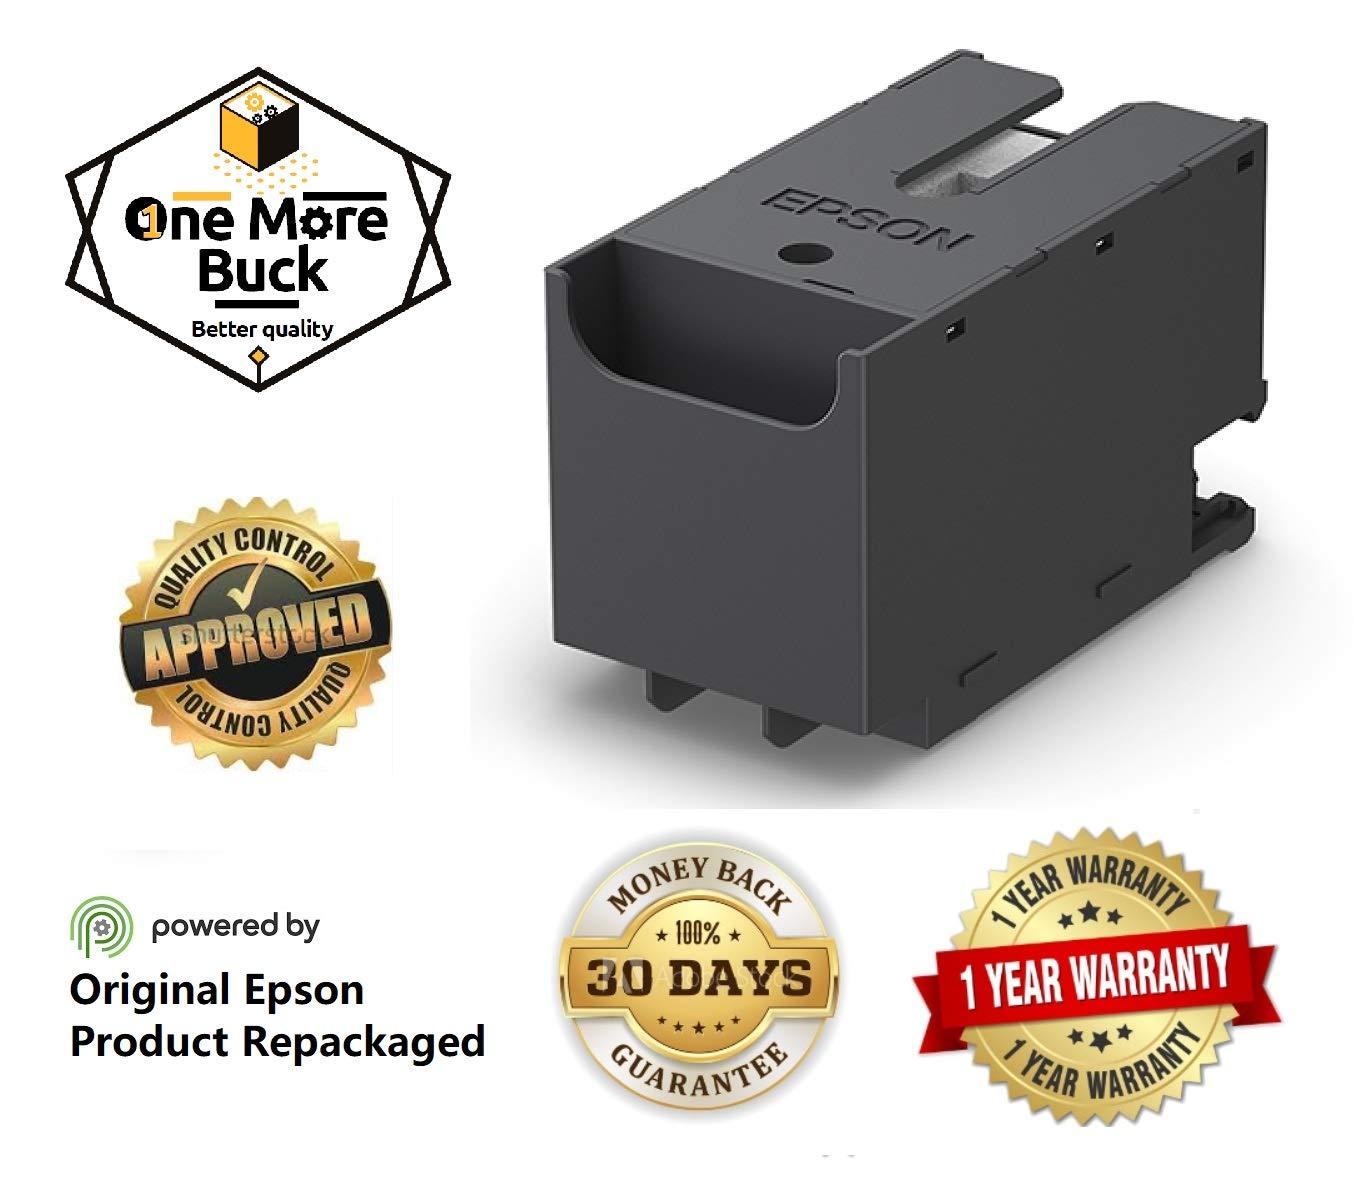 Amazon.com: OneMoreBuck - Caja de mantenimiento de tinta ...